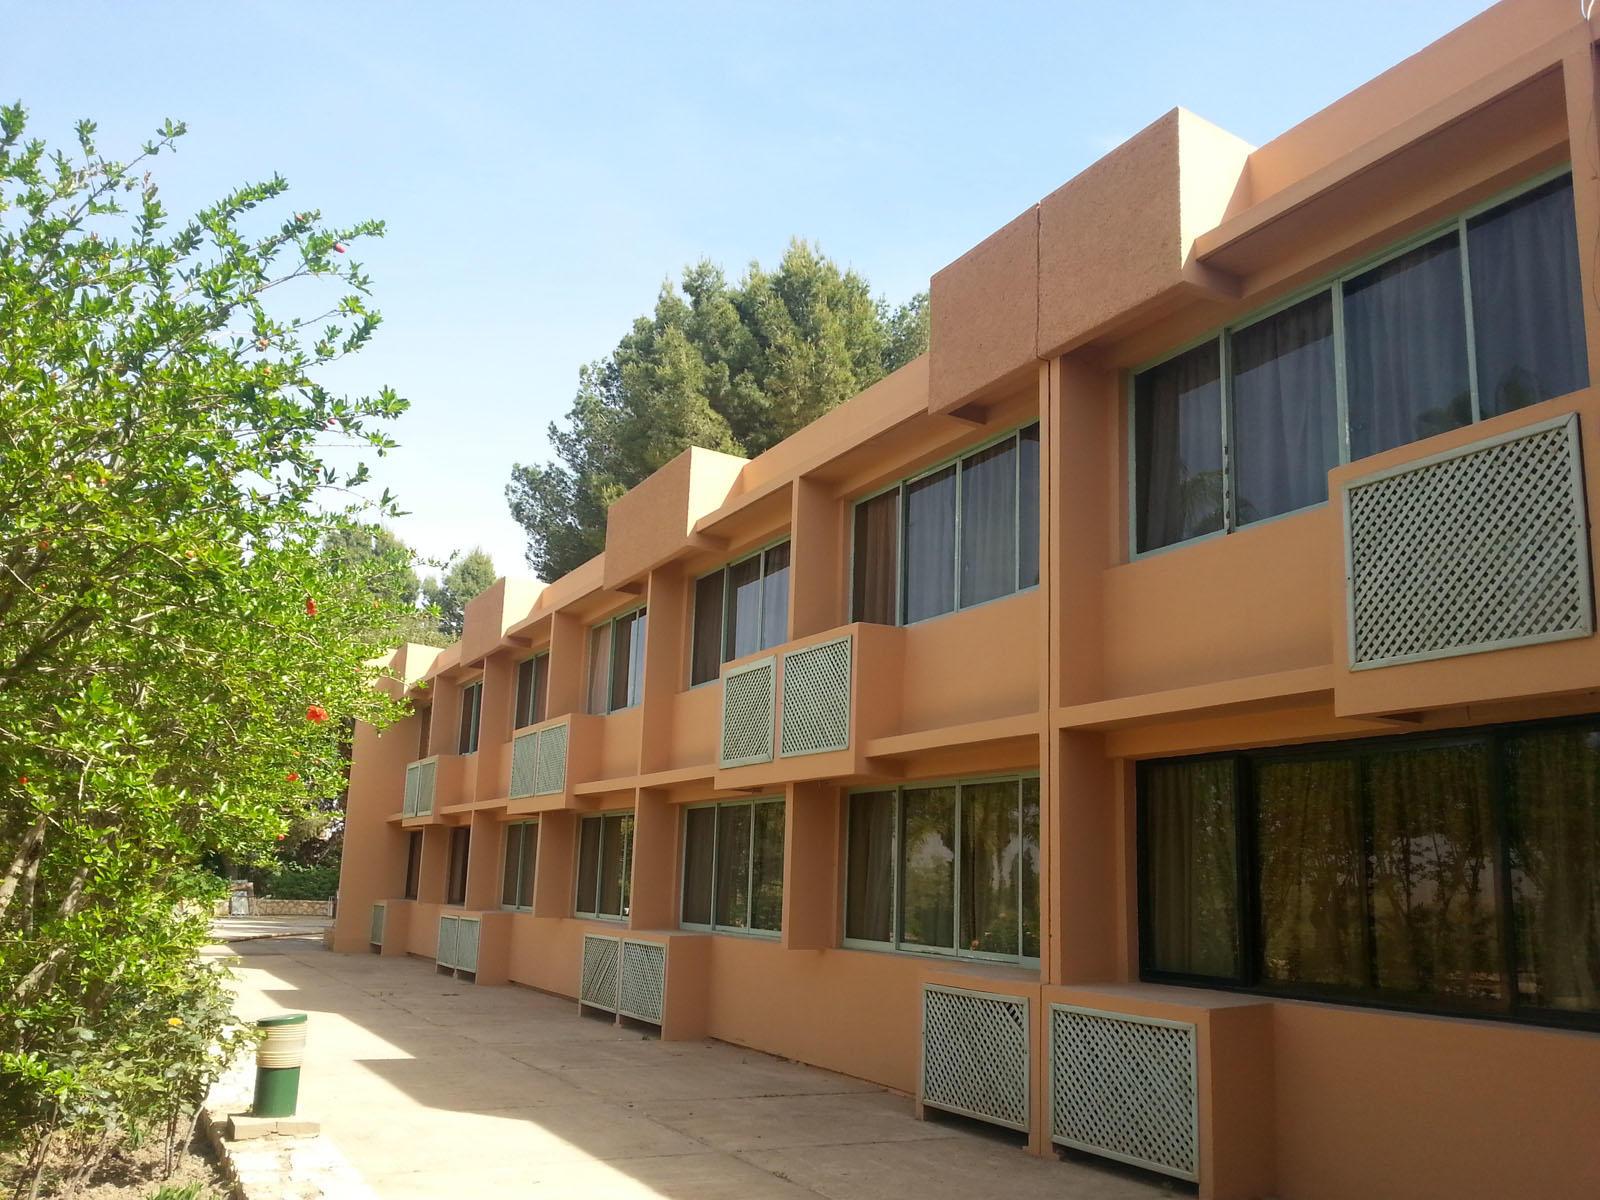 Garden at Kenzi Rissani Hotel in Errachidia, Morocco